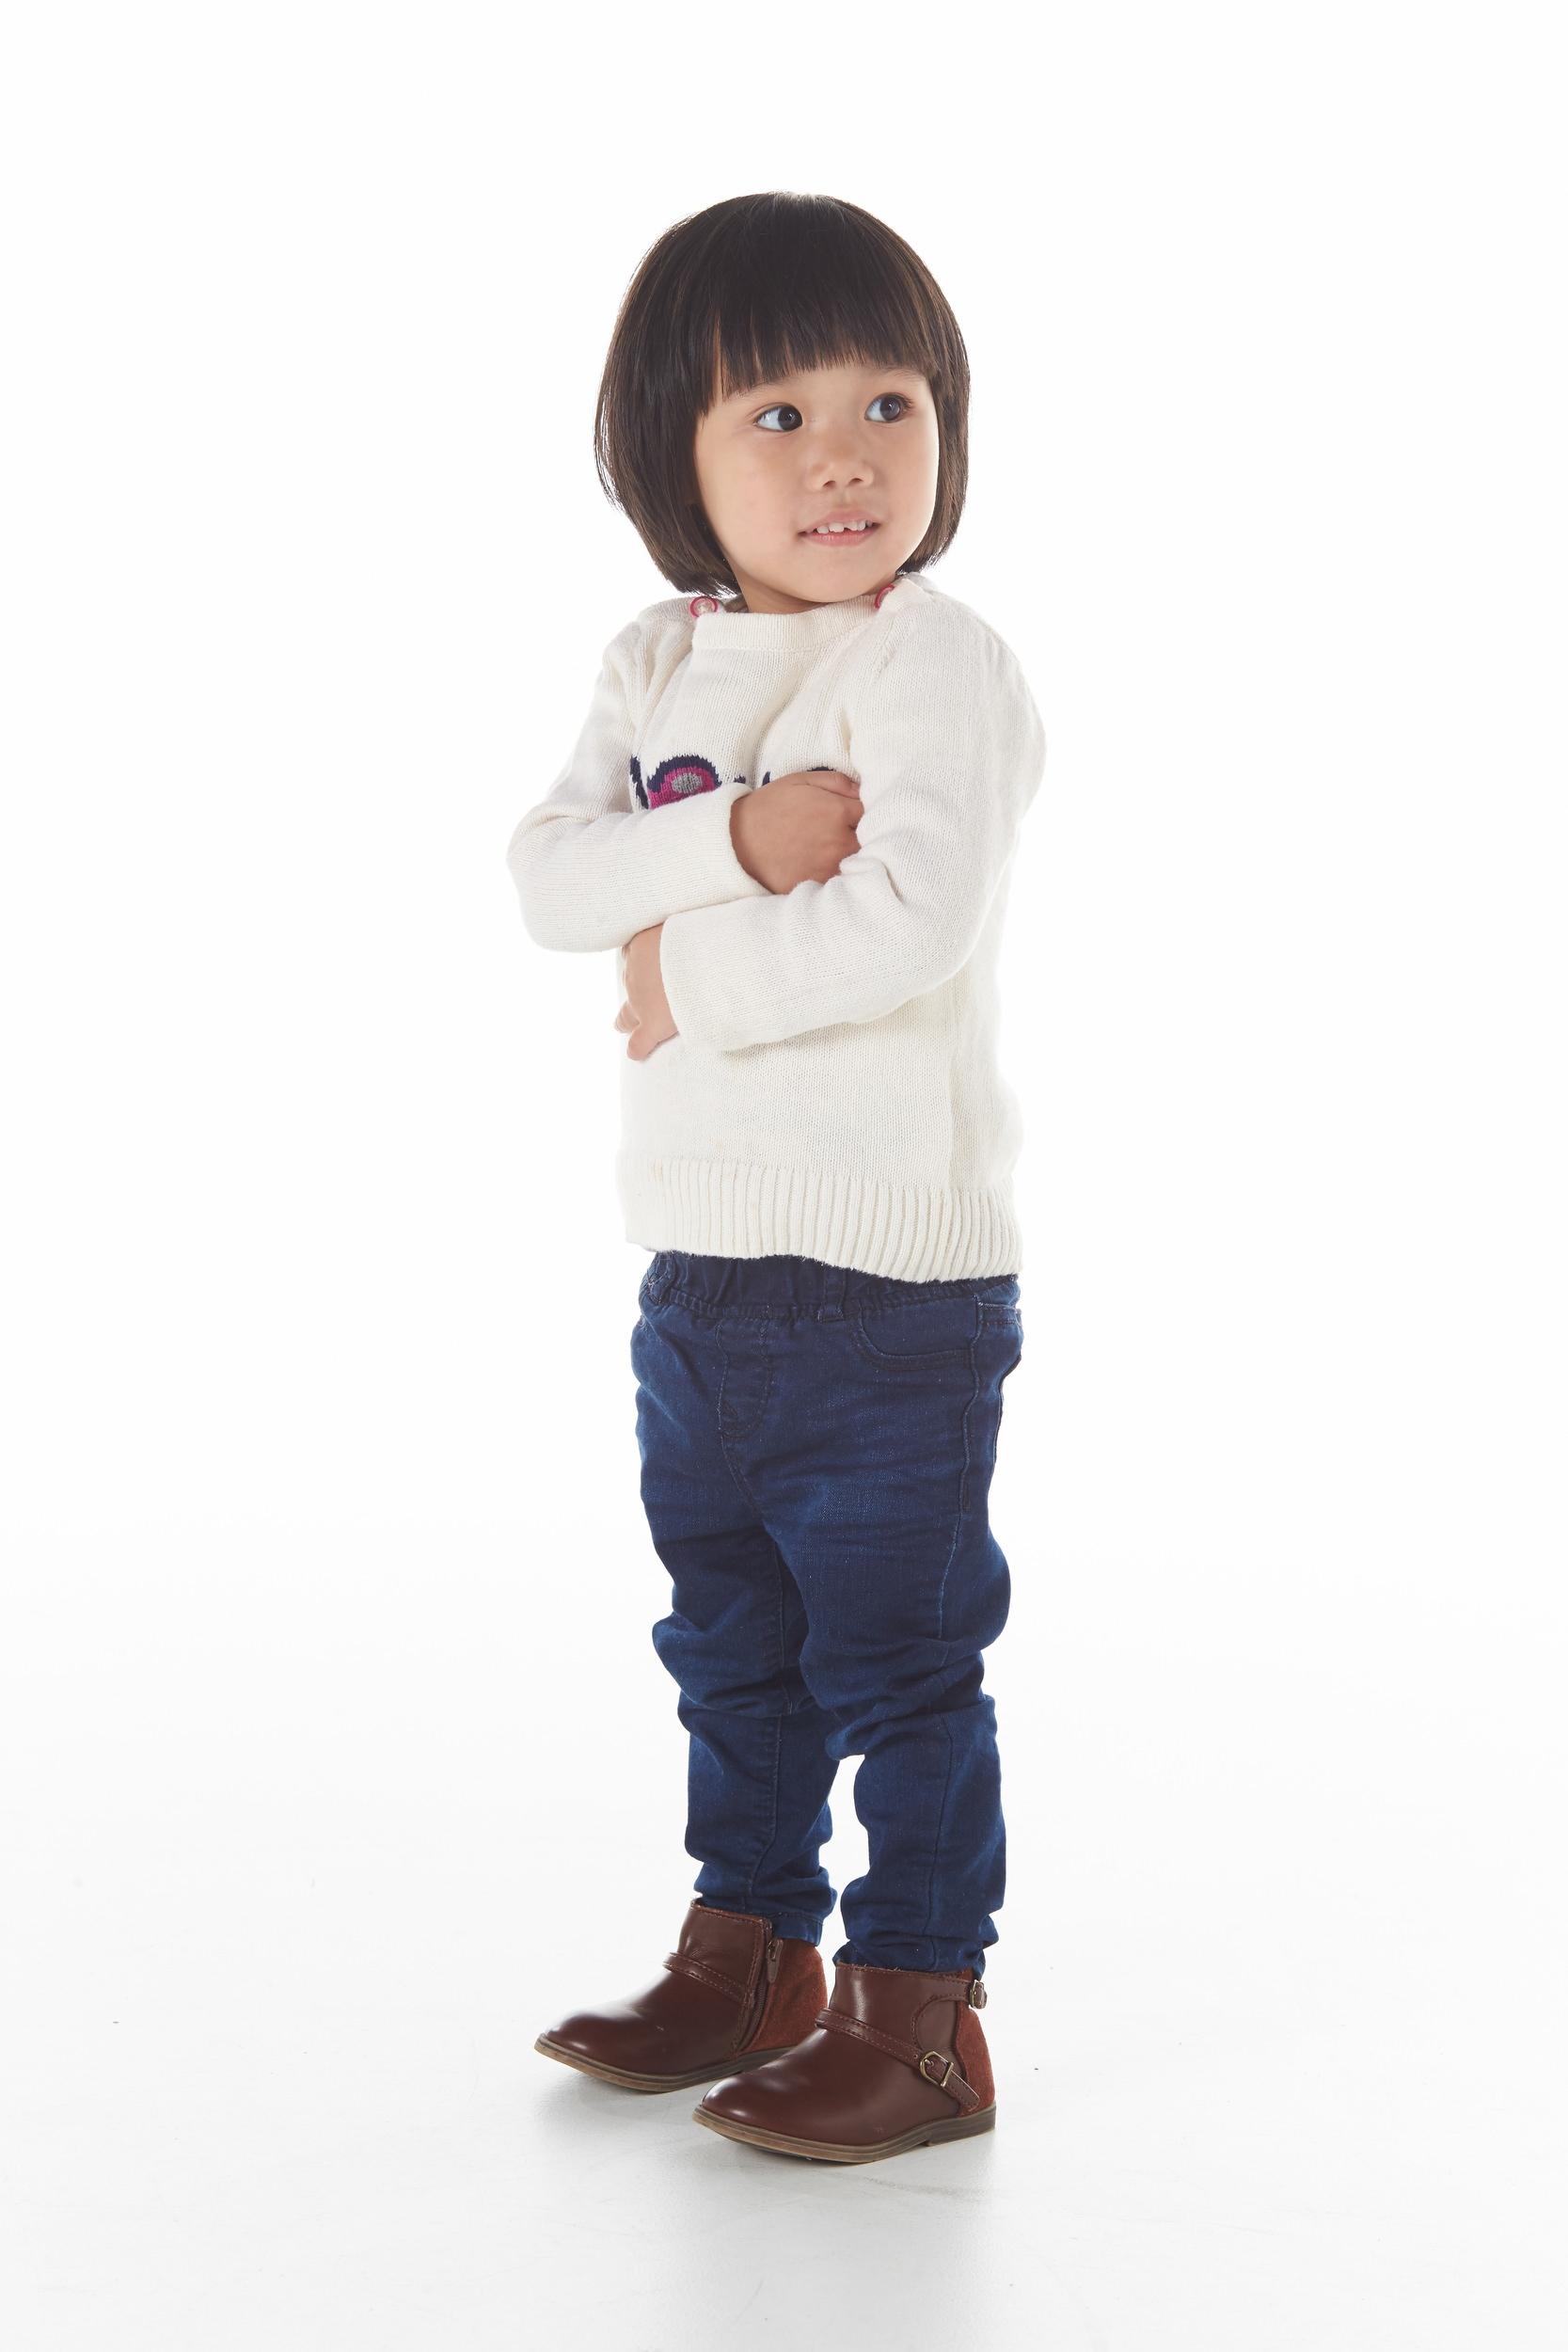 familieshoot, kinderfoto, kinderfotografie